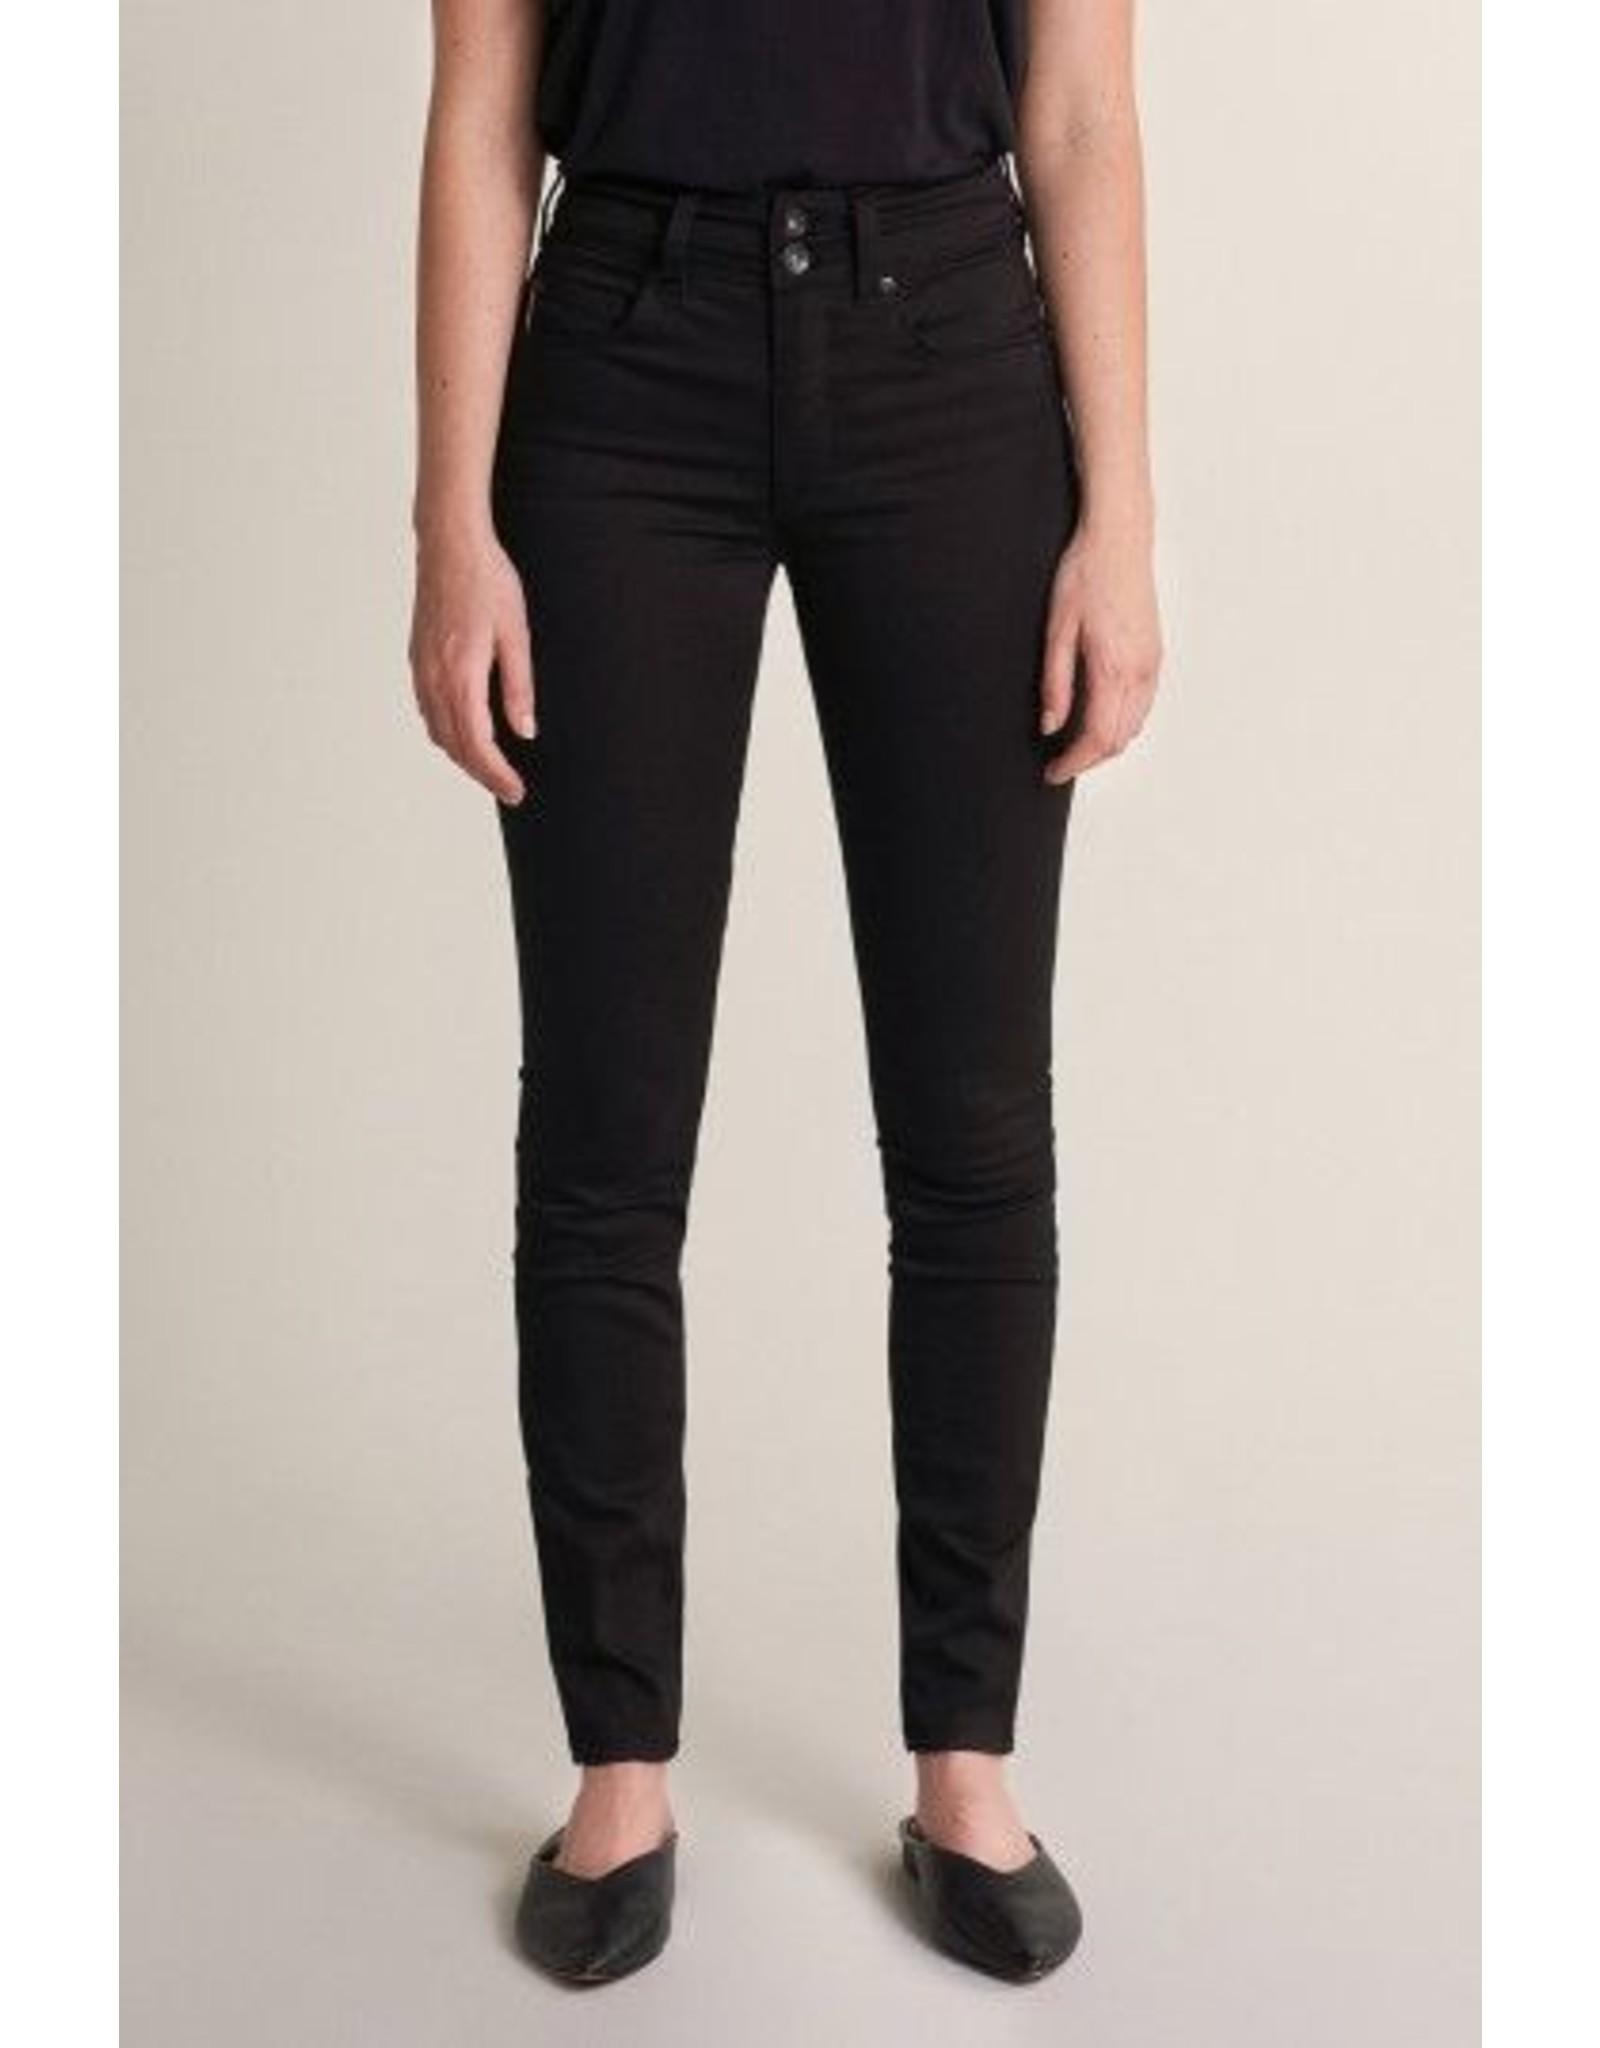 Salsa Jeans Push in Secret black jeans